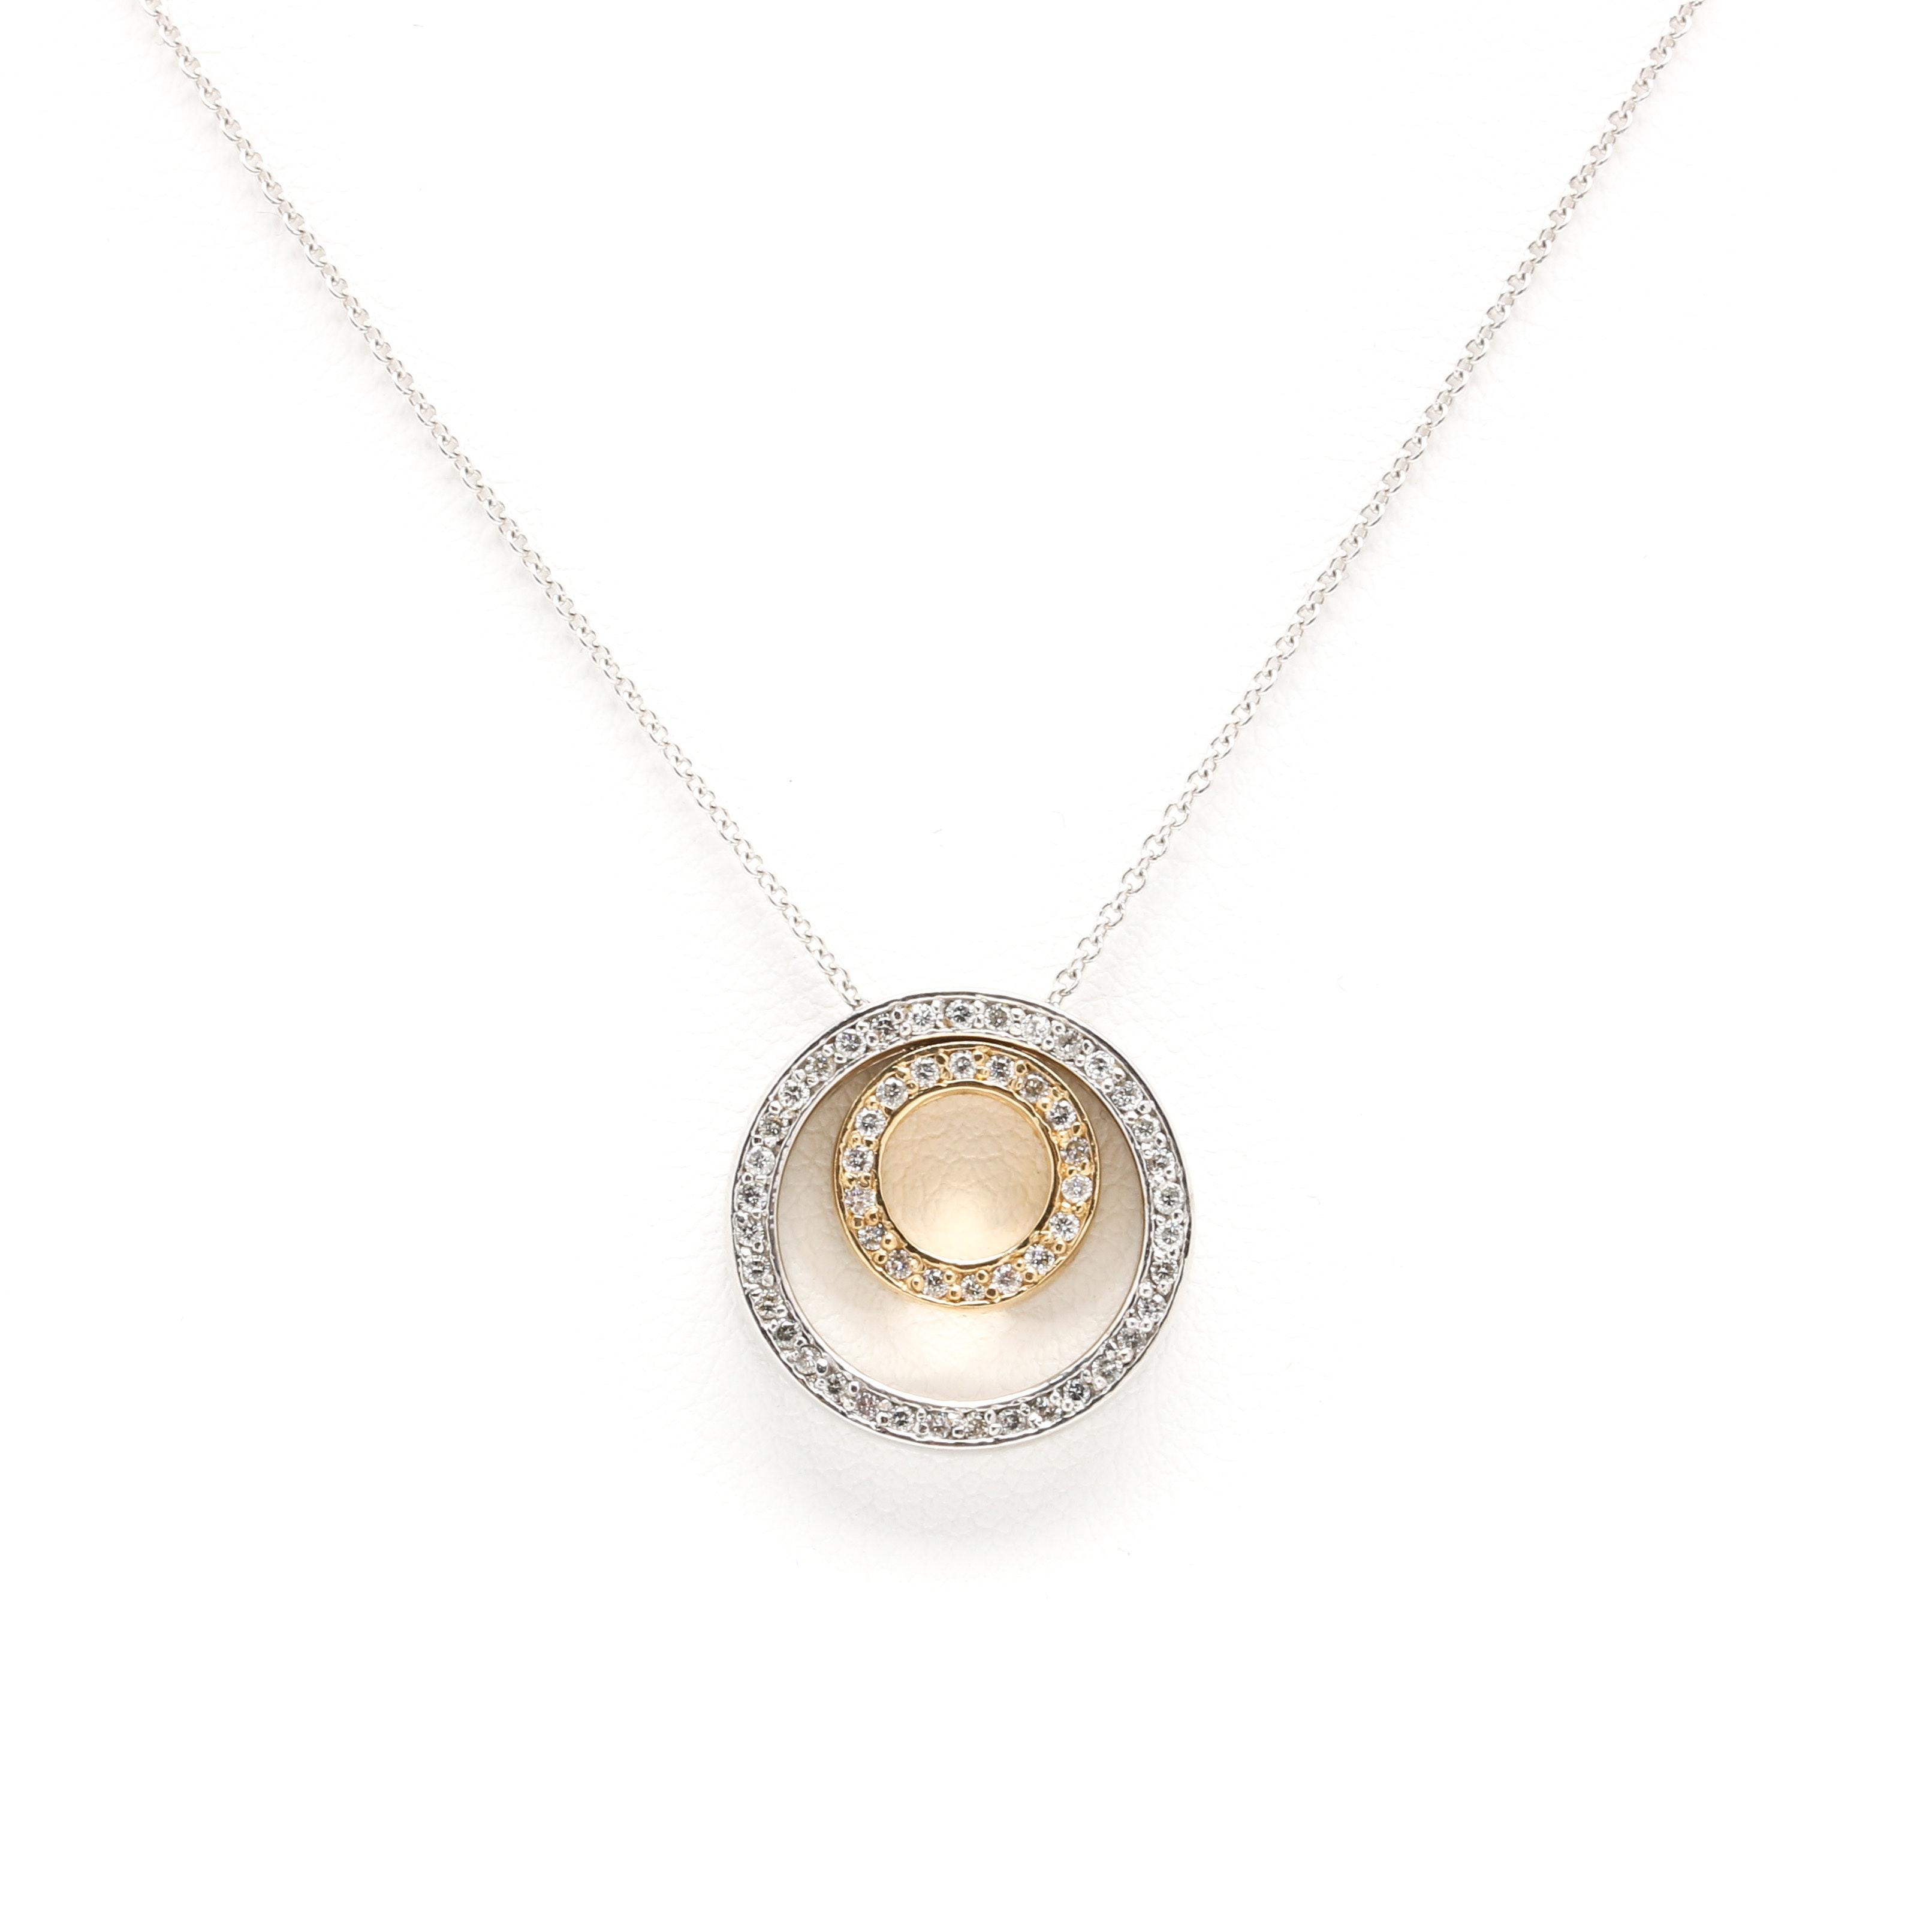 14K Two Tone Gold Diamond Pendant Necklace